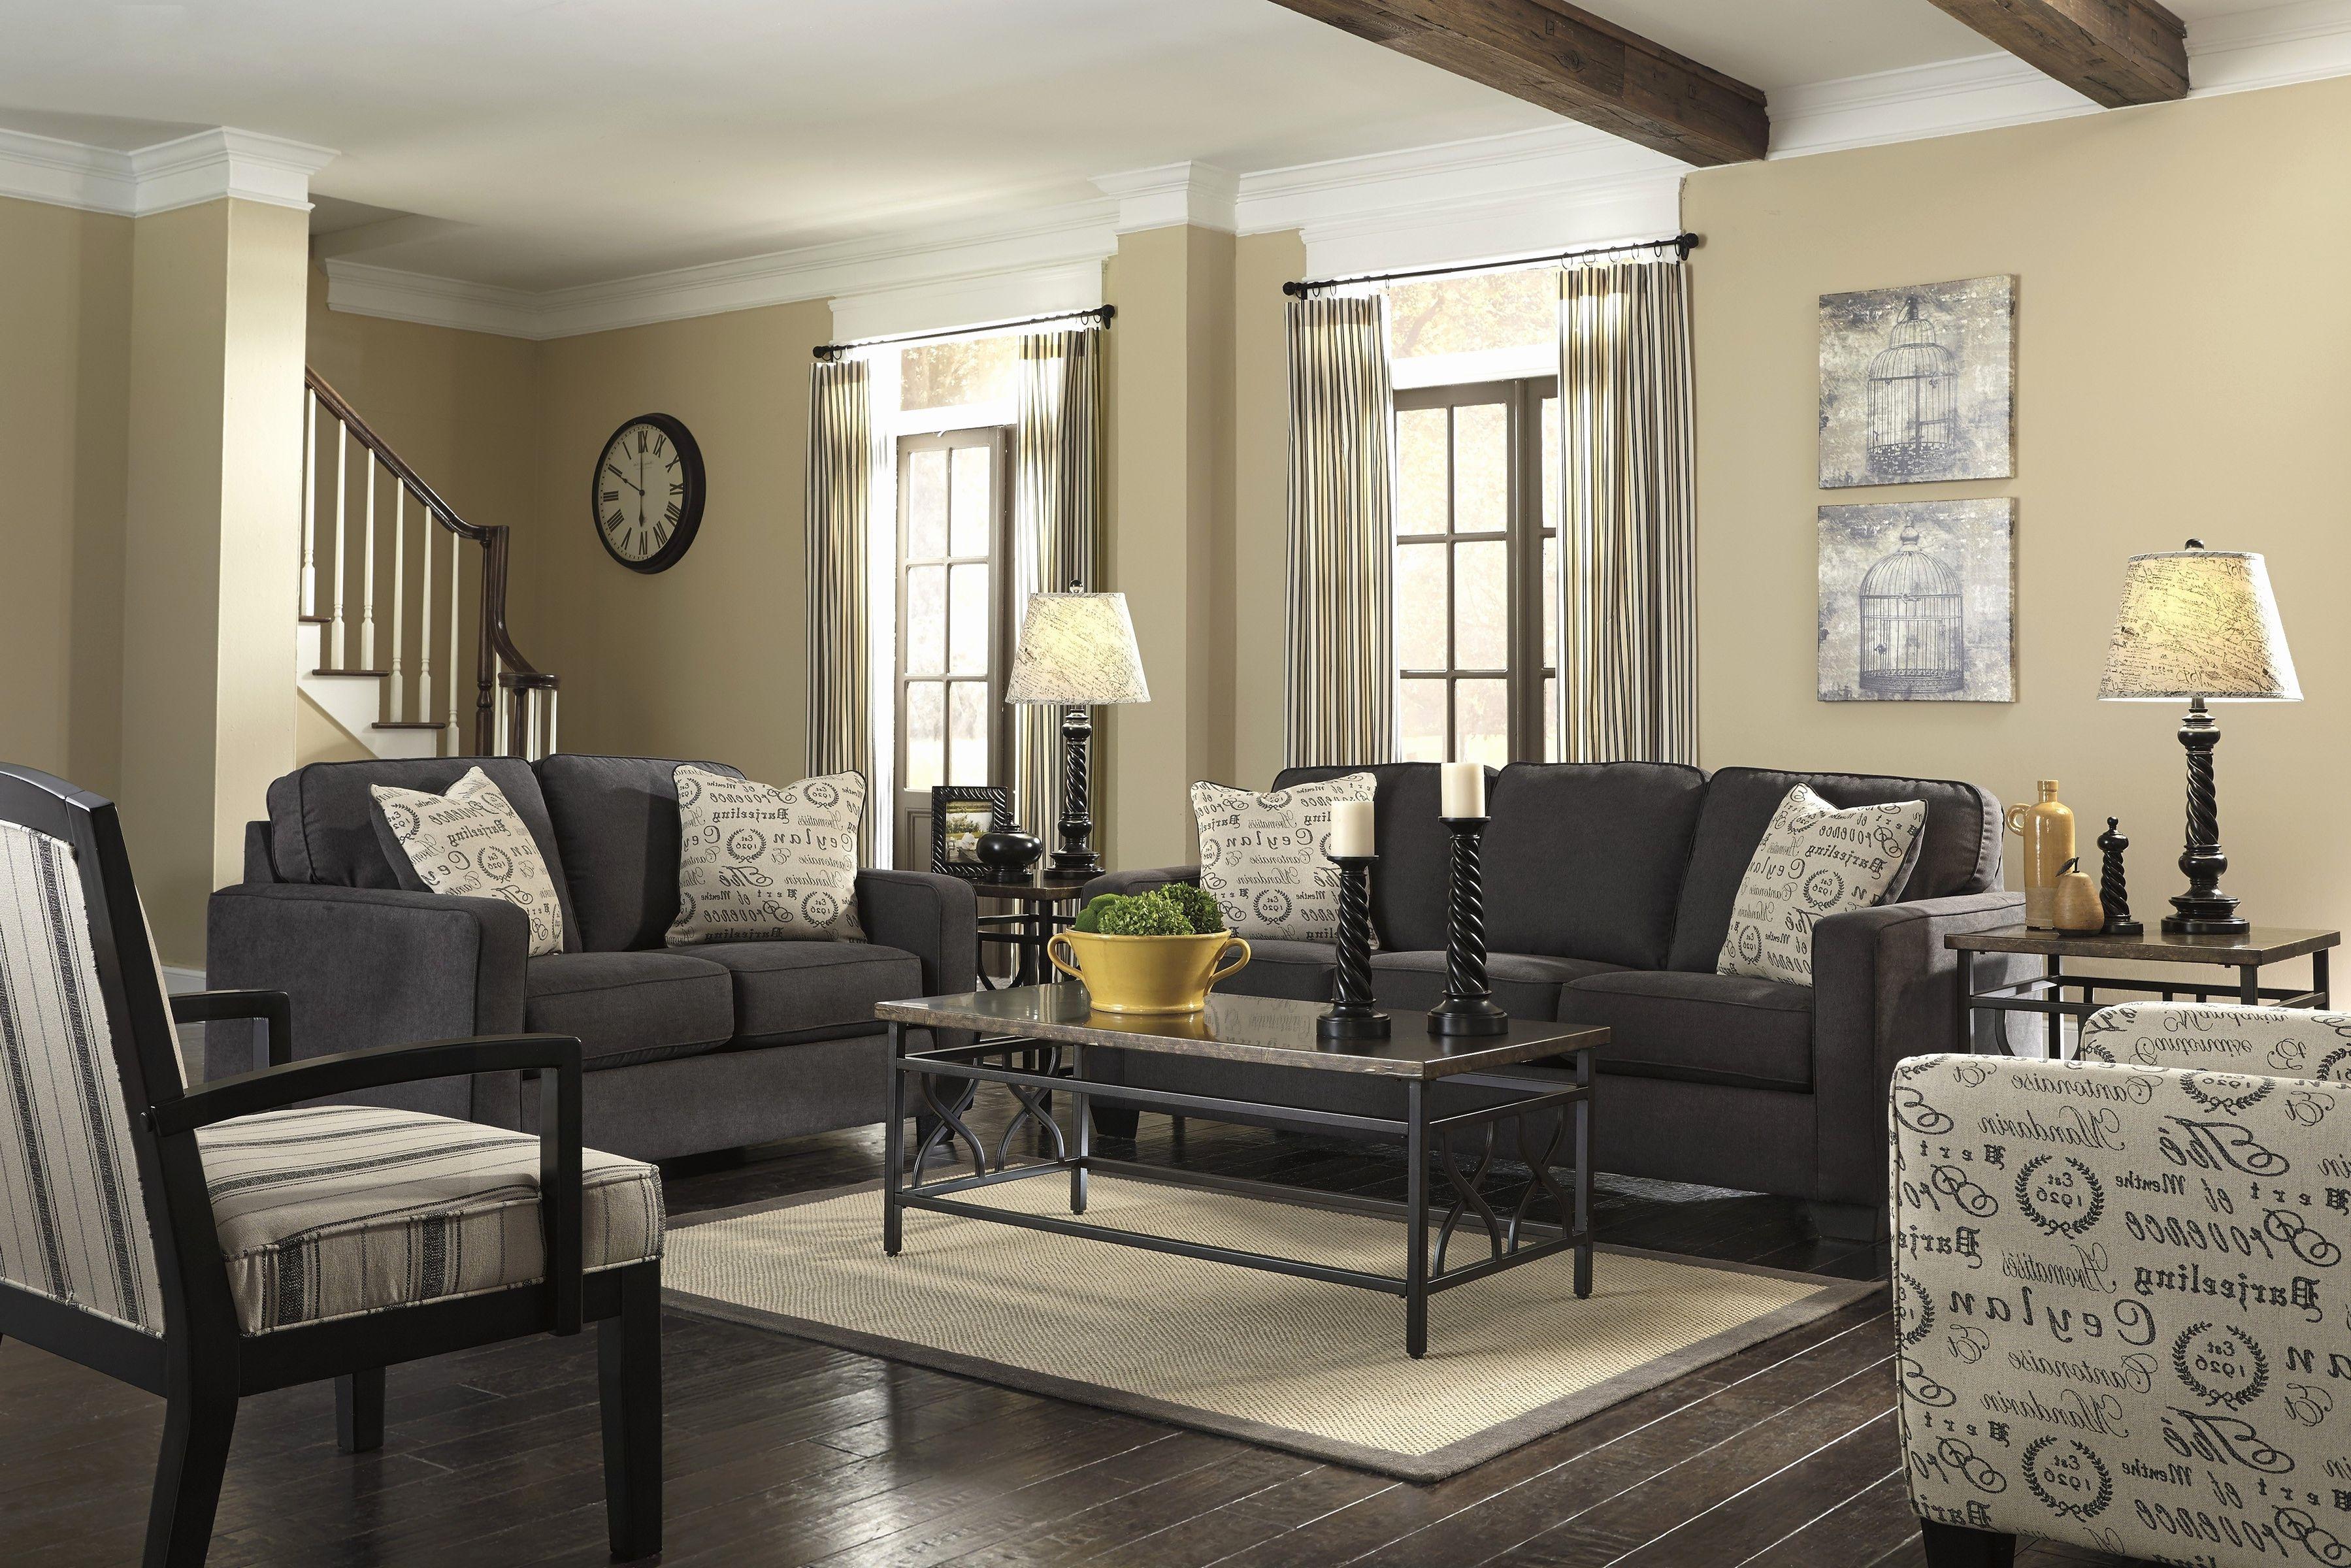 luxury grey sofa living room decor image grey sofa living on 2021 paint colors living room id=79378